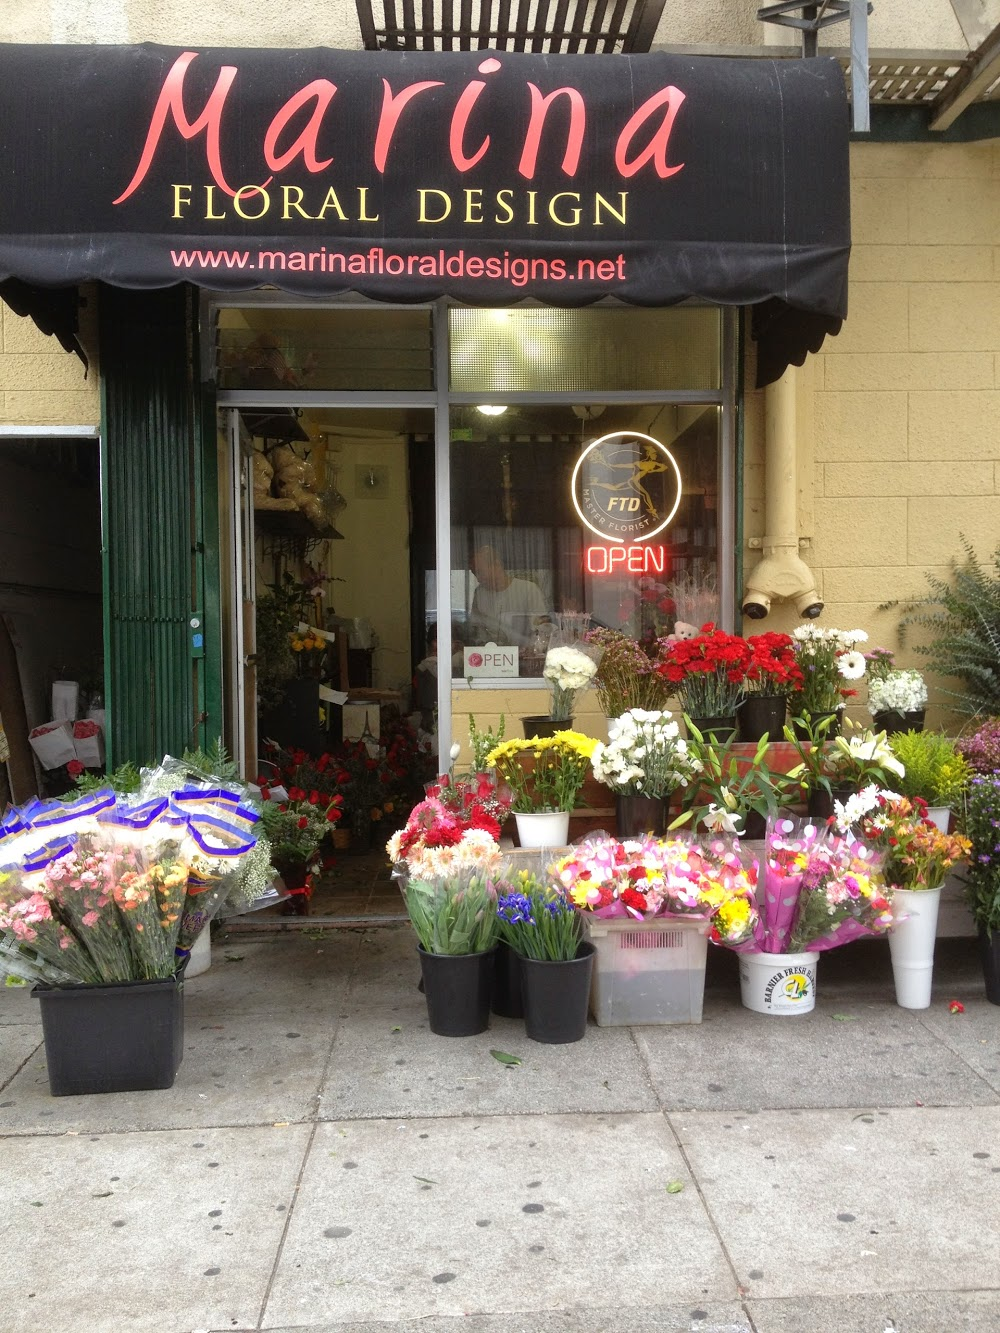 Marina Floral Design